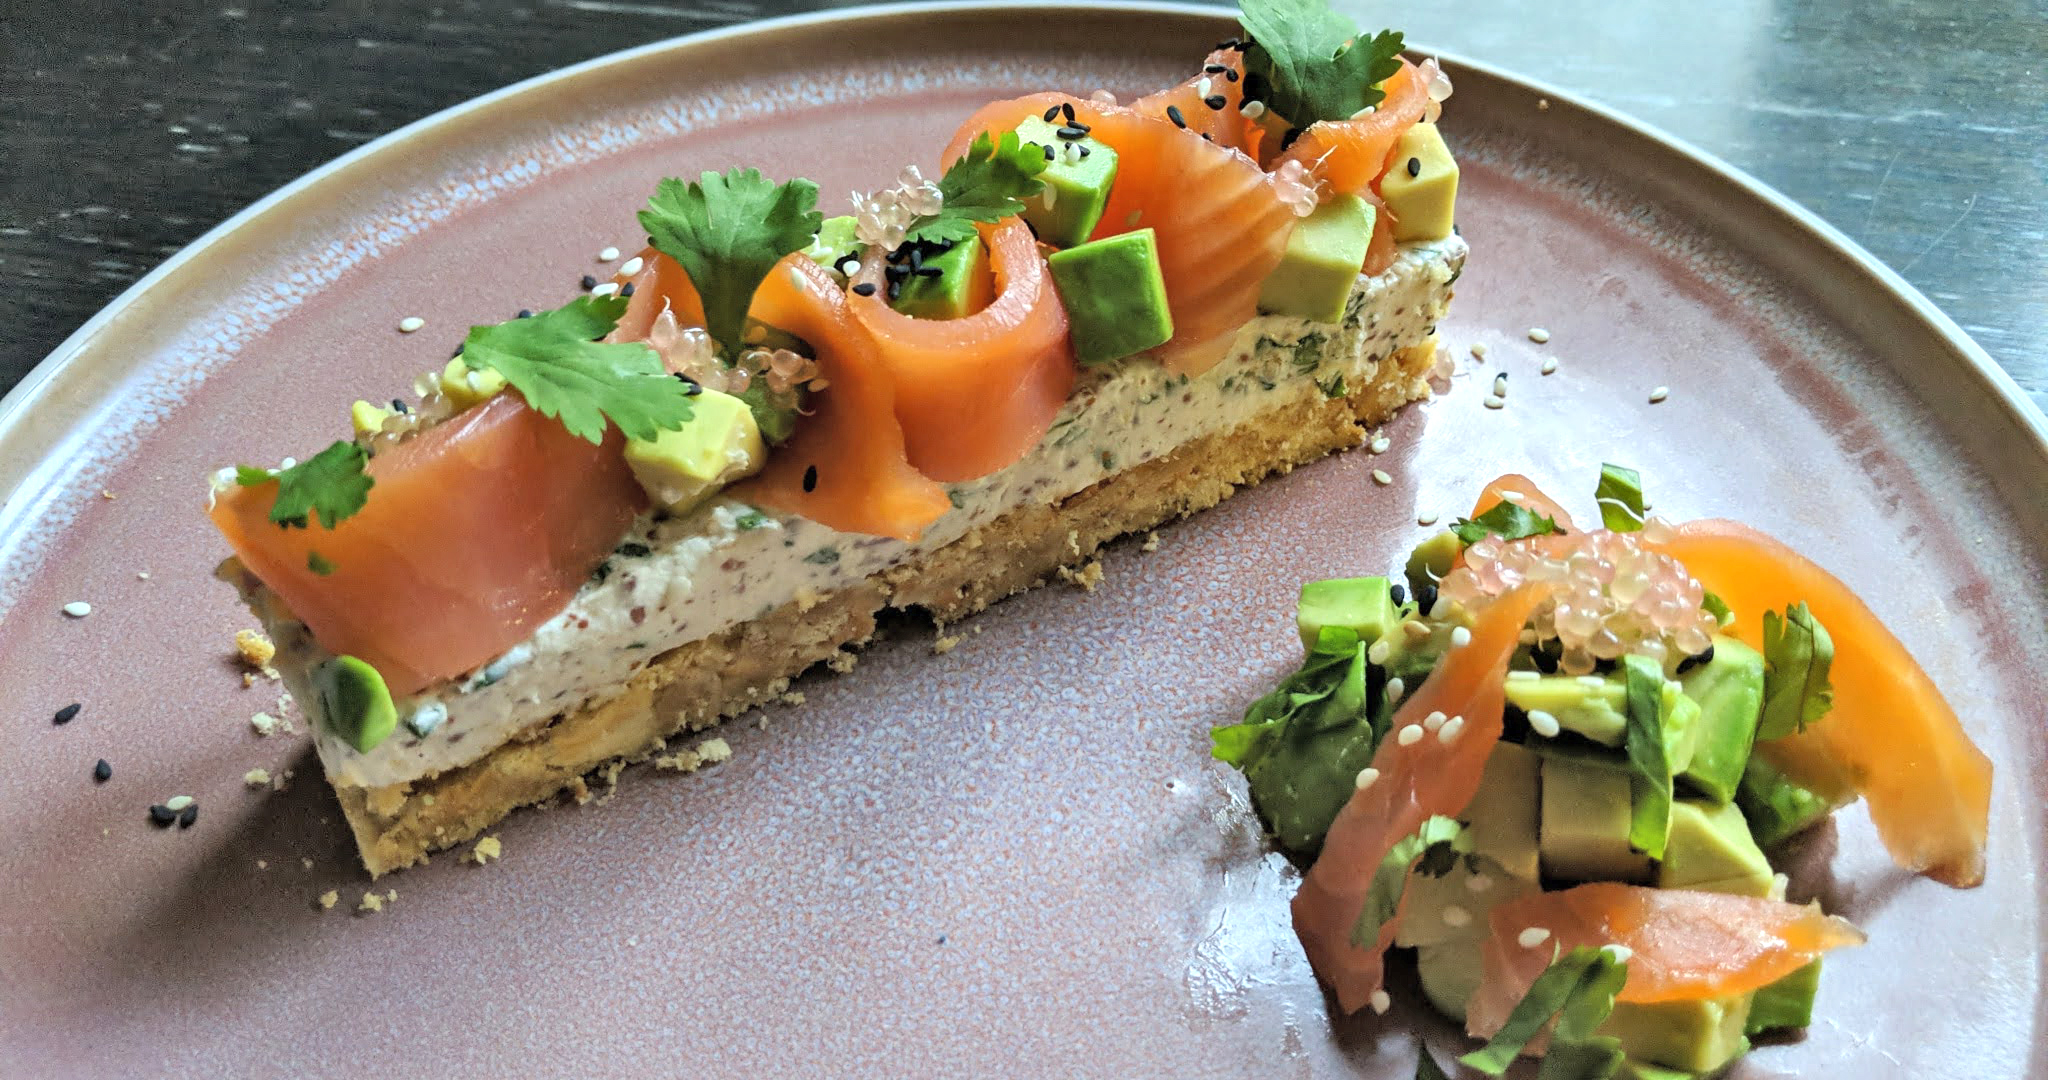 Cheesecake façon avocado toast saumon et citron caviar